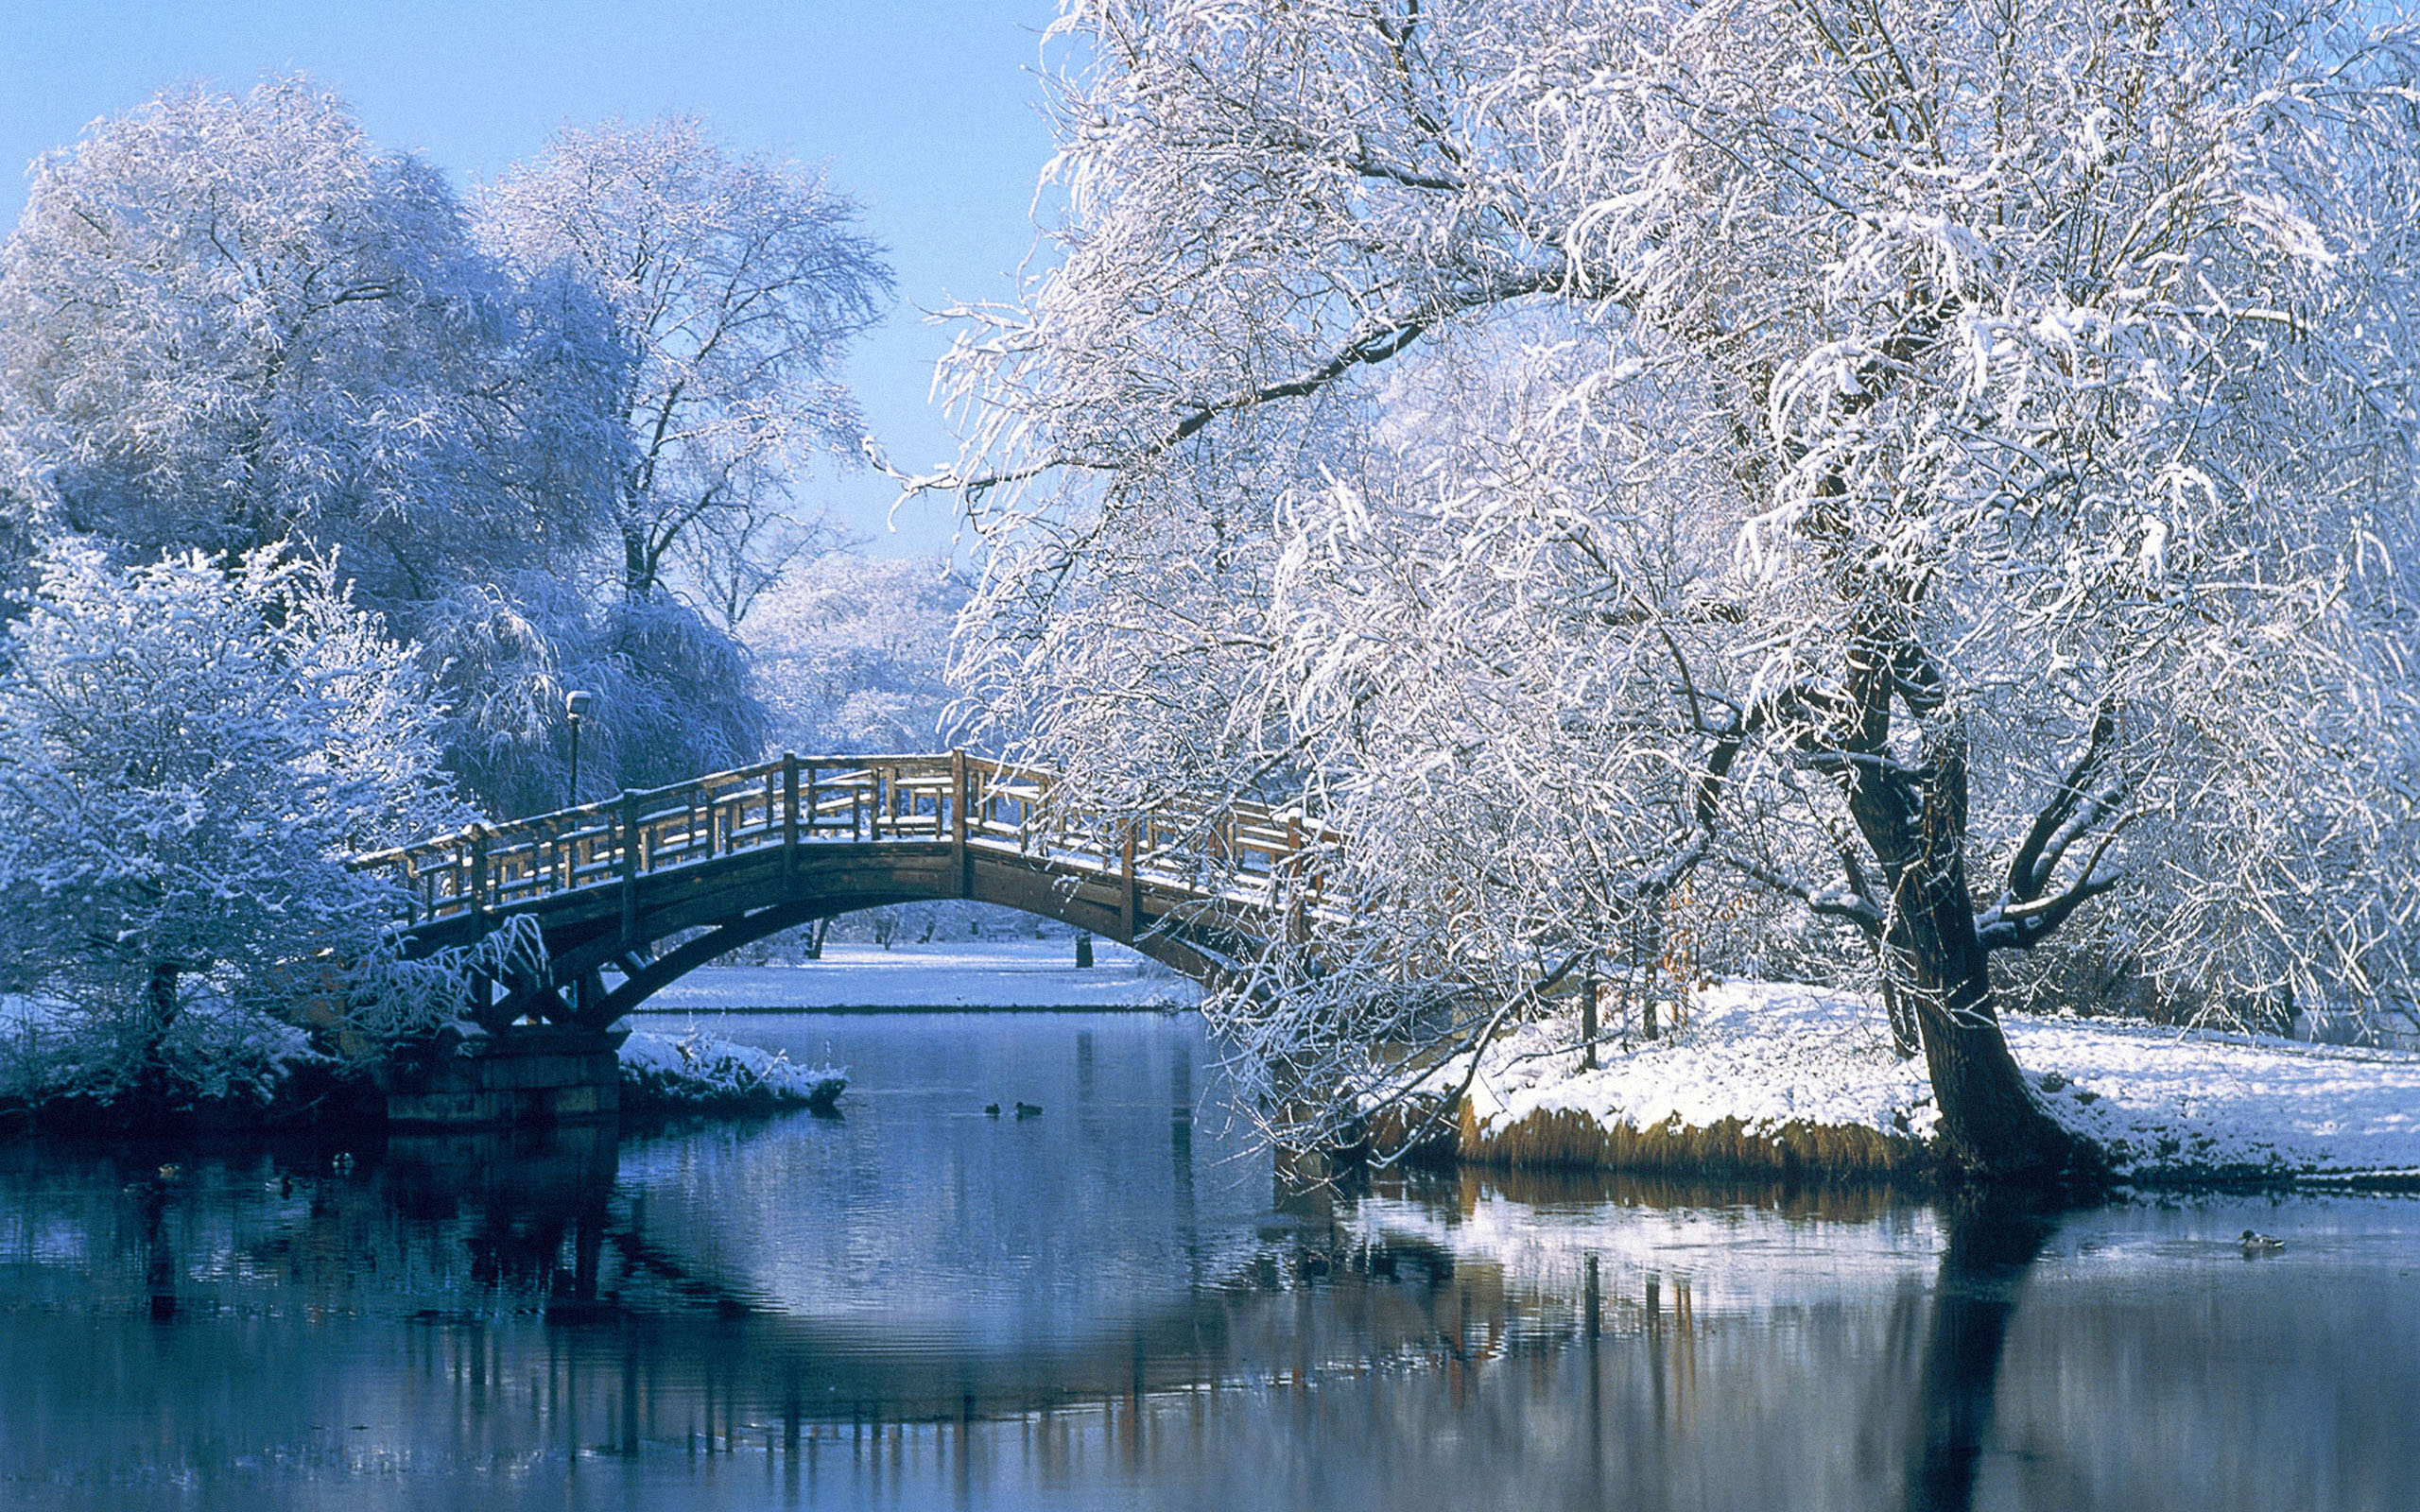 Winter And Snow Scenes Desktop Wallpapers for Widescreen HD 2560x1600